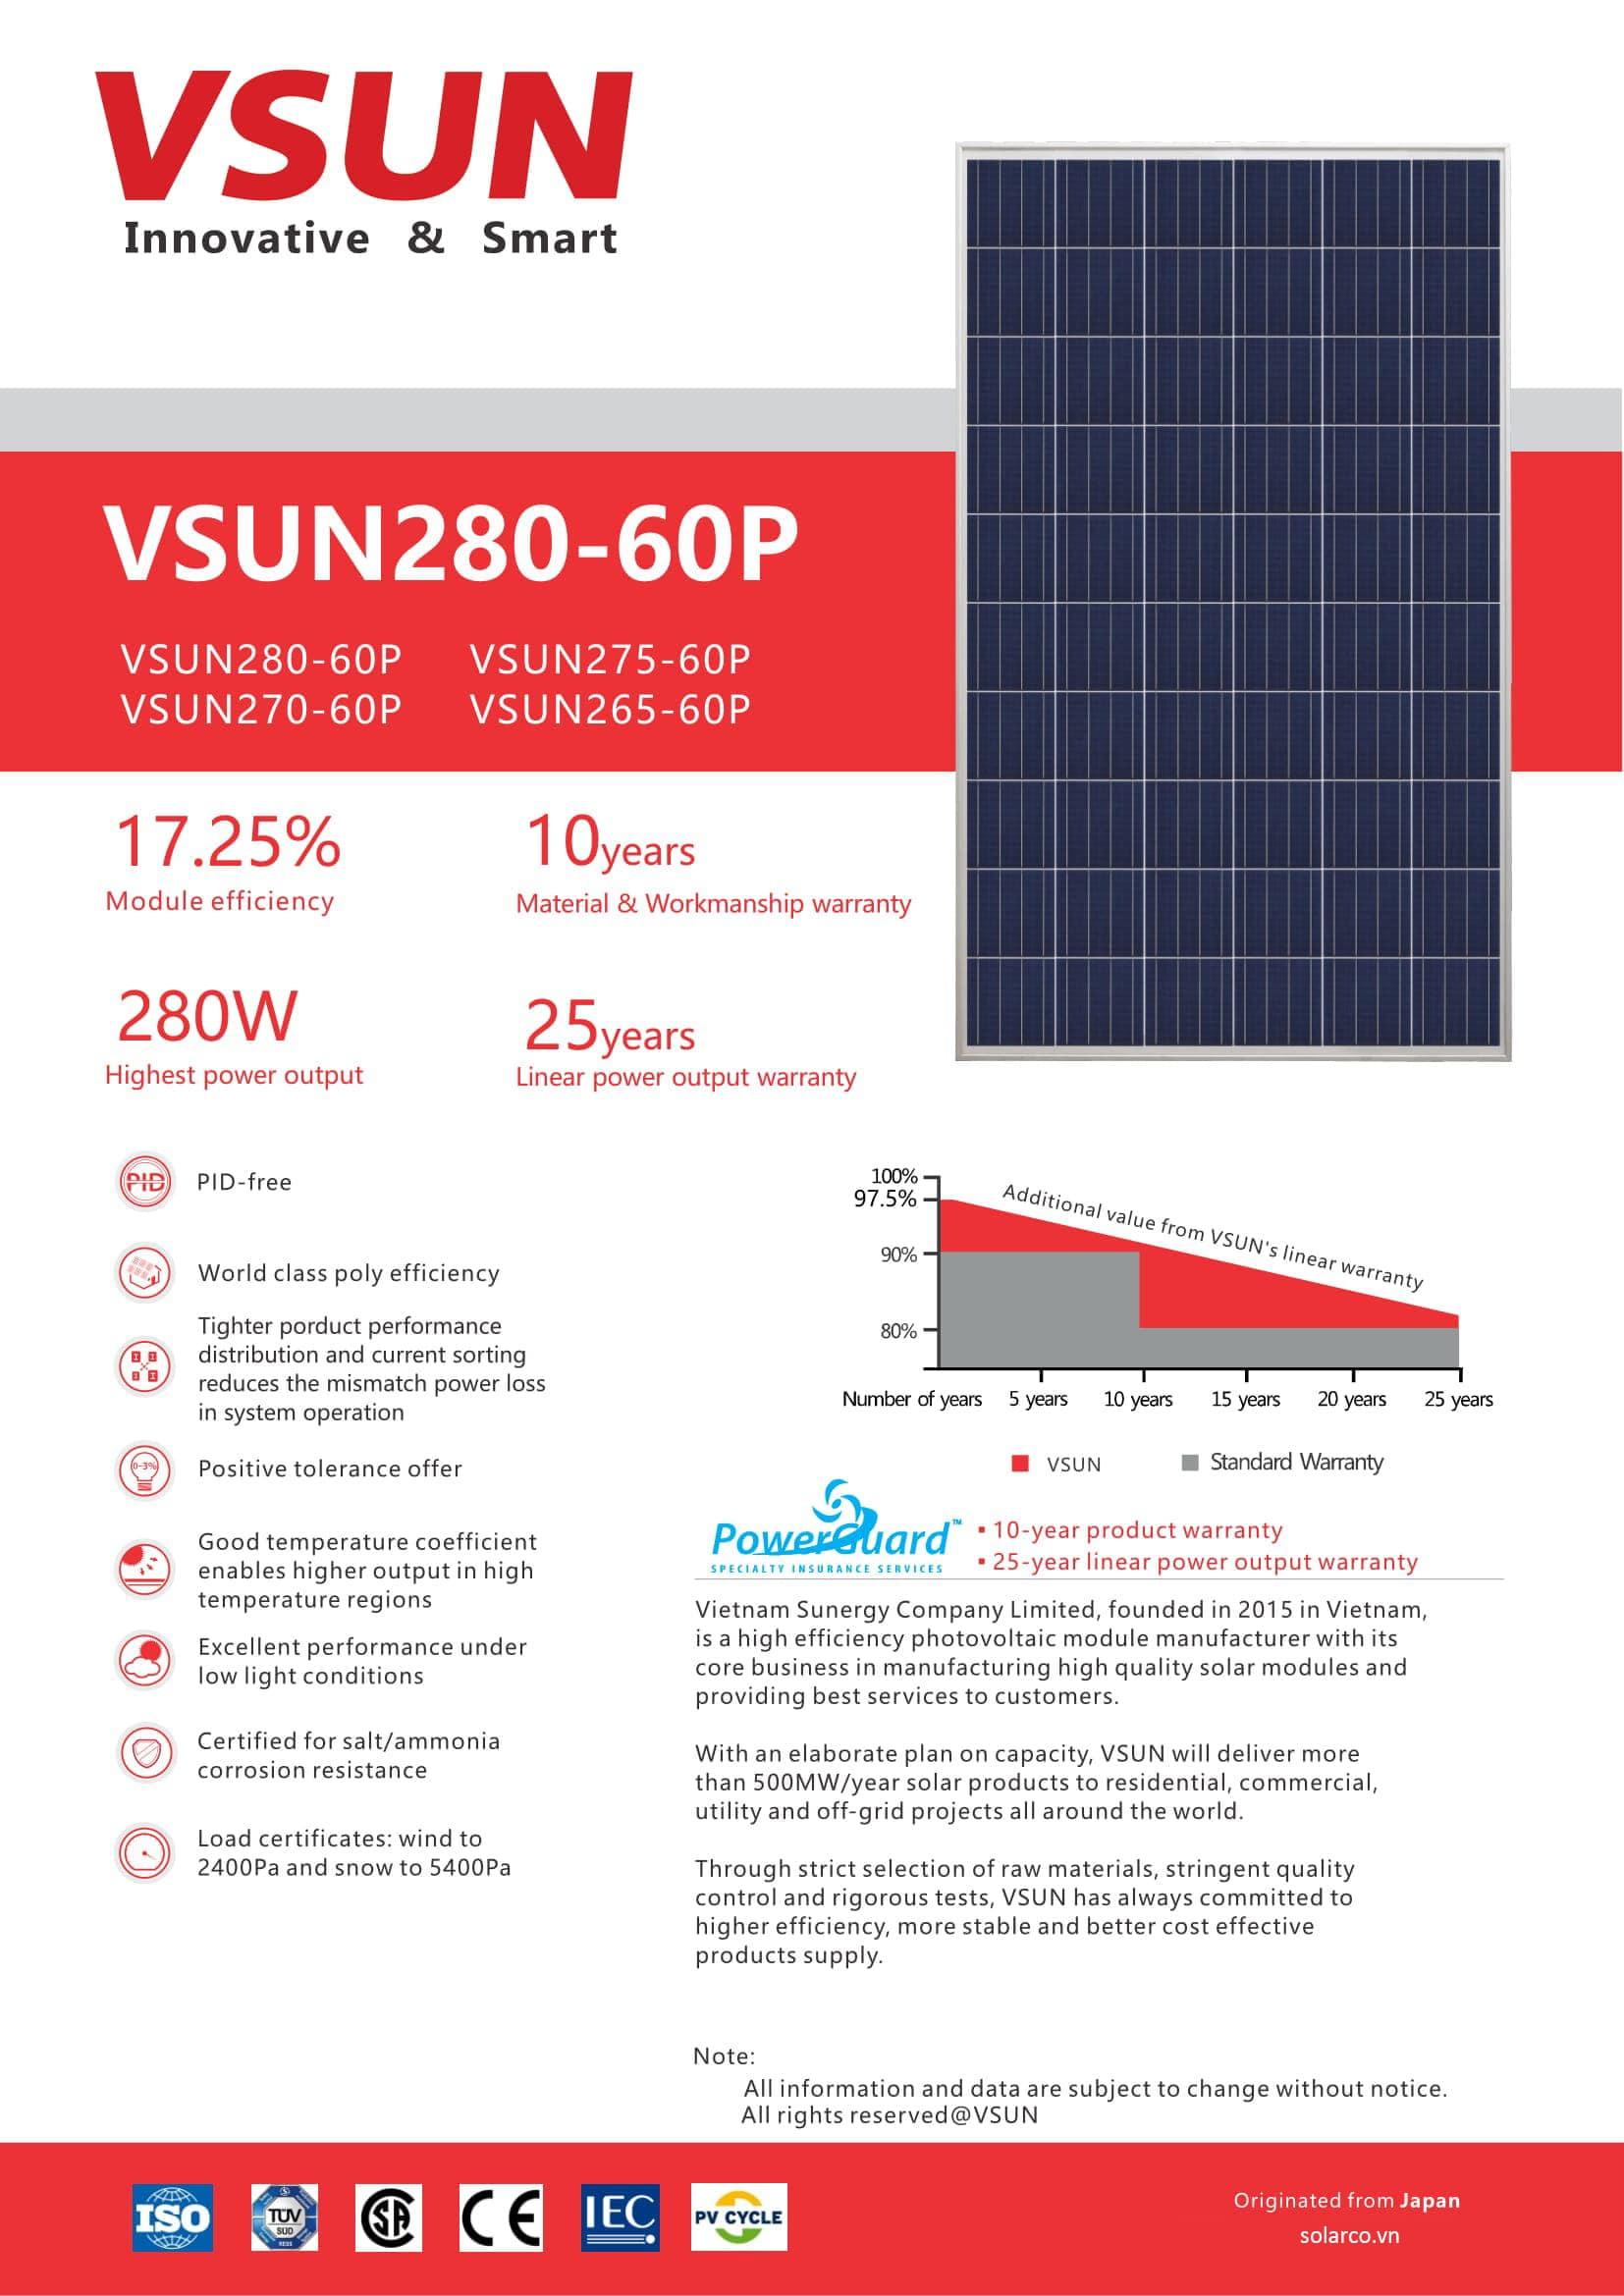 vsun280-60p-solar-module-4bb5bb-3535-1-f0c2ace2-f79b-4da3-b012-a5e11fa0871b